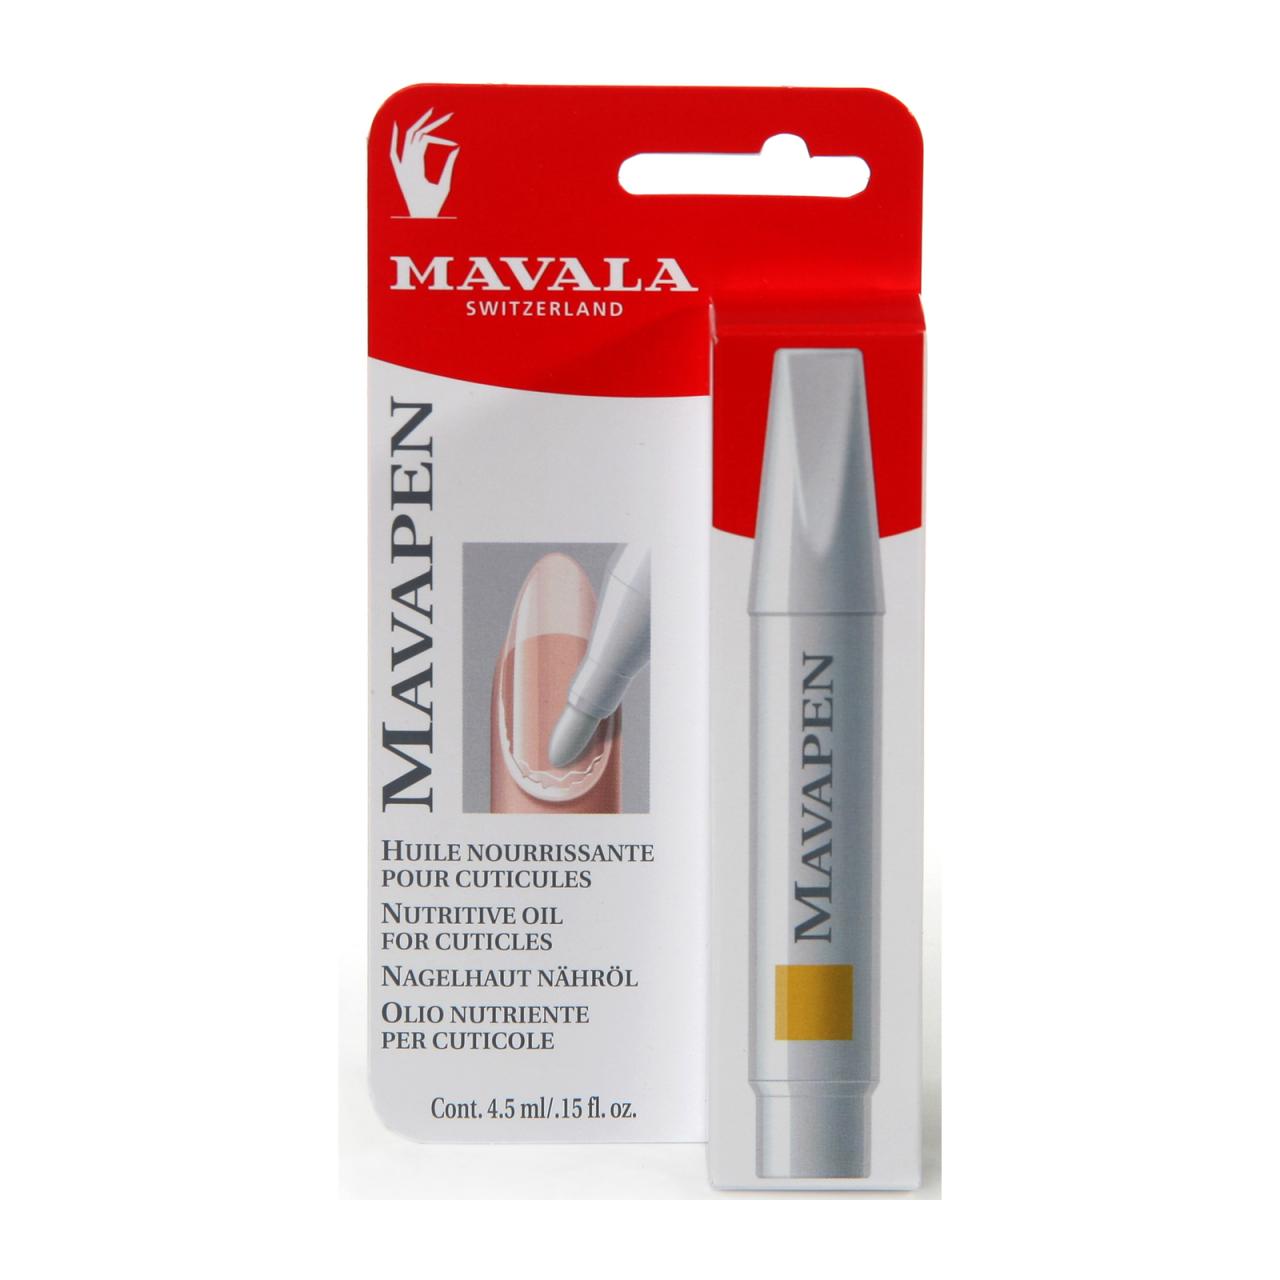 Mavala - Mavapen -